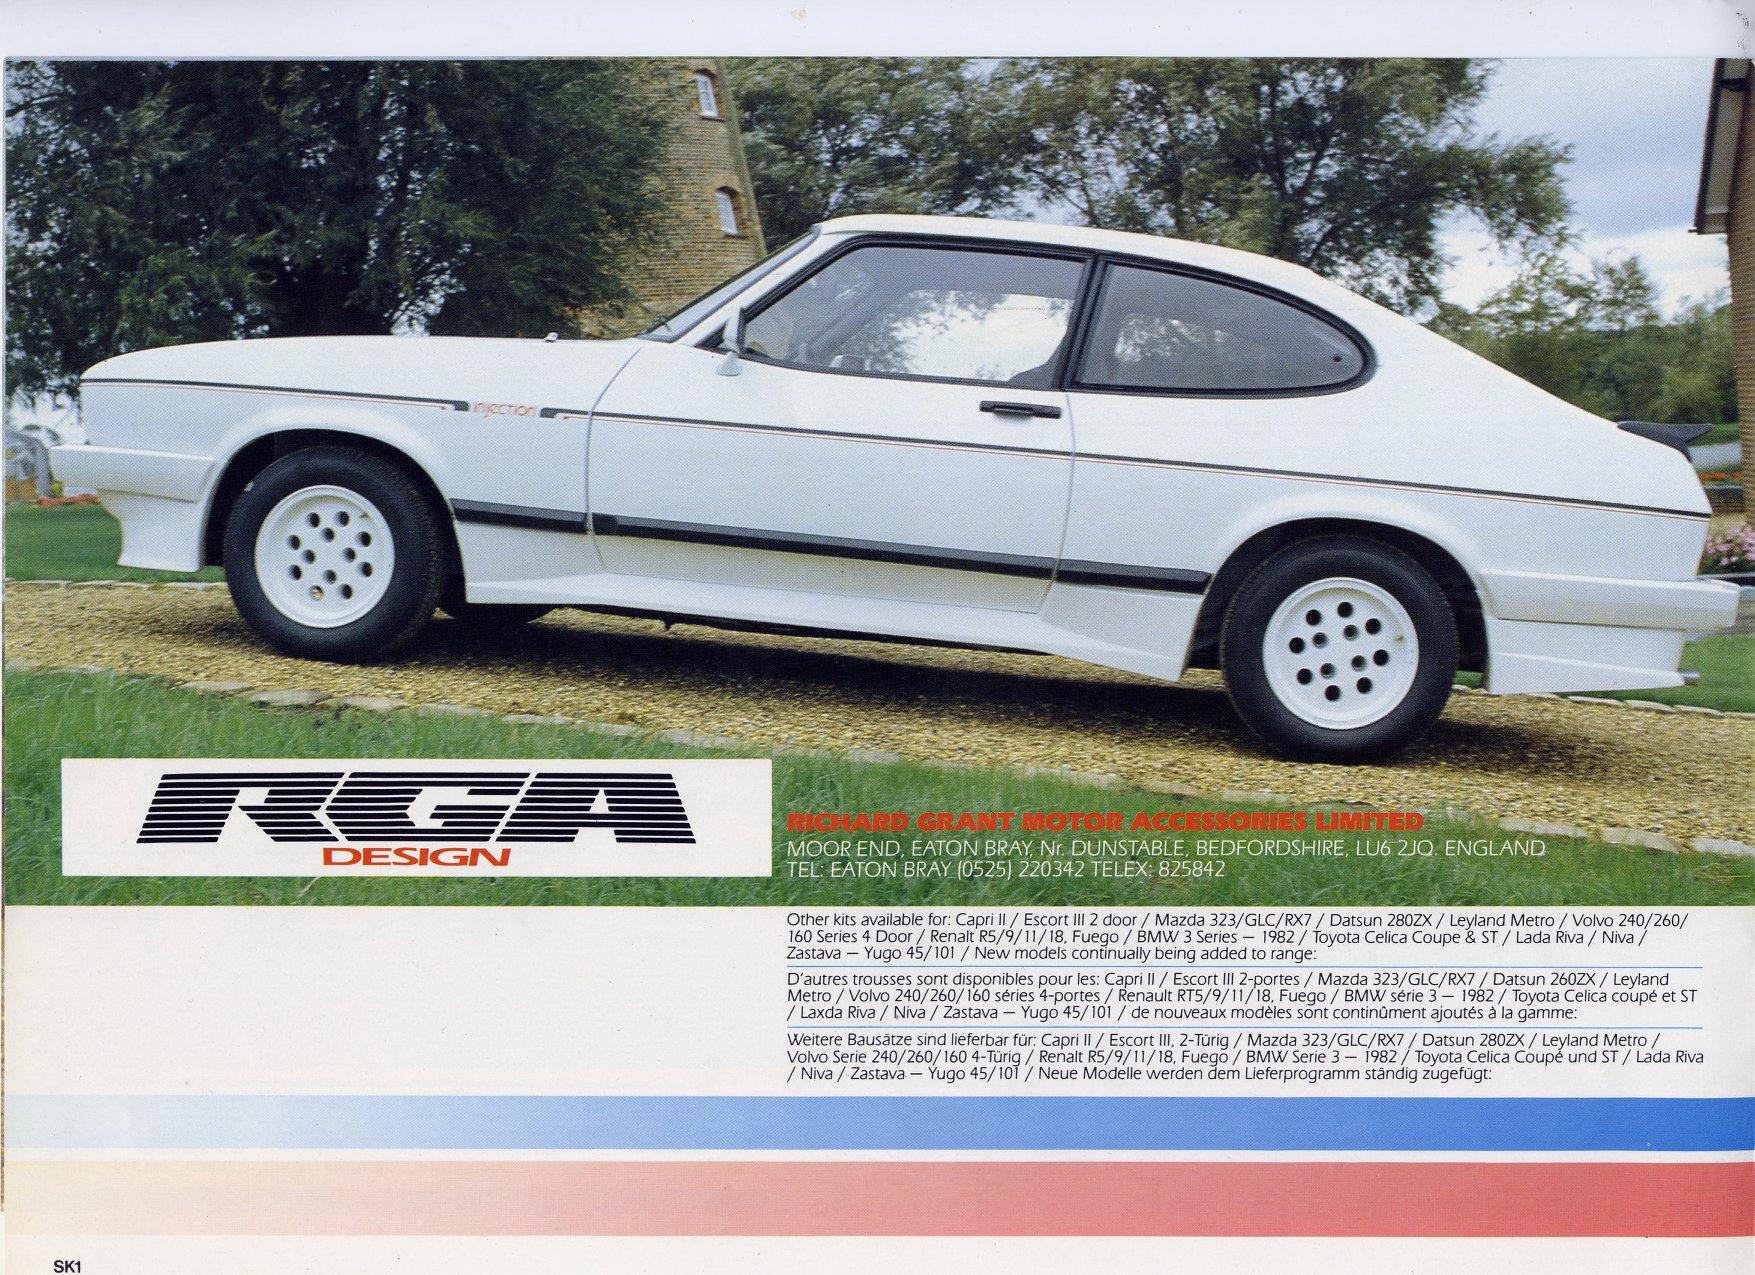 RGA-Bodykit-brosjyre-3